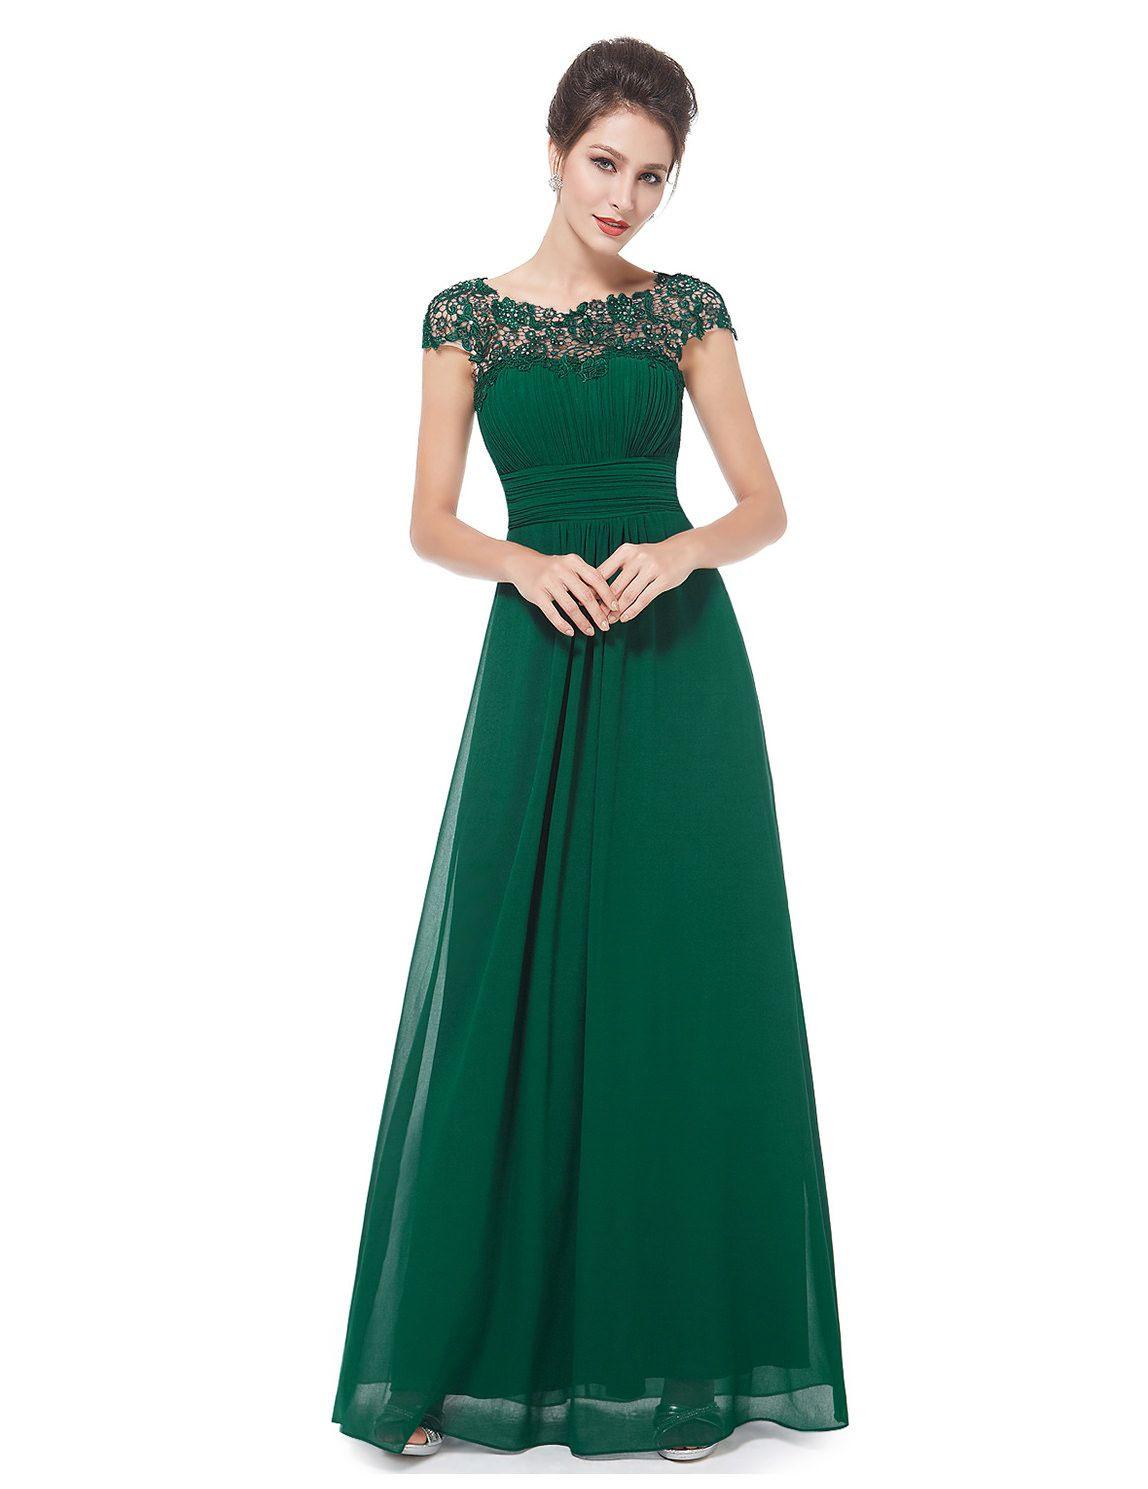 Formal Perfekt Olivgrünes Abendkleid Stylish15 Spektakulär Olivgrünes Abendkleid Ärmel